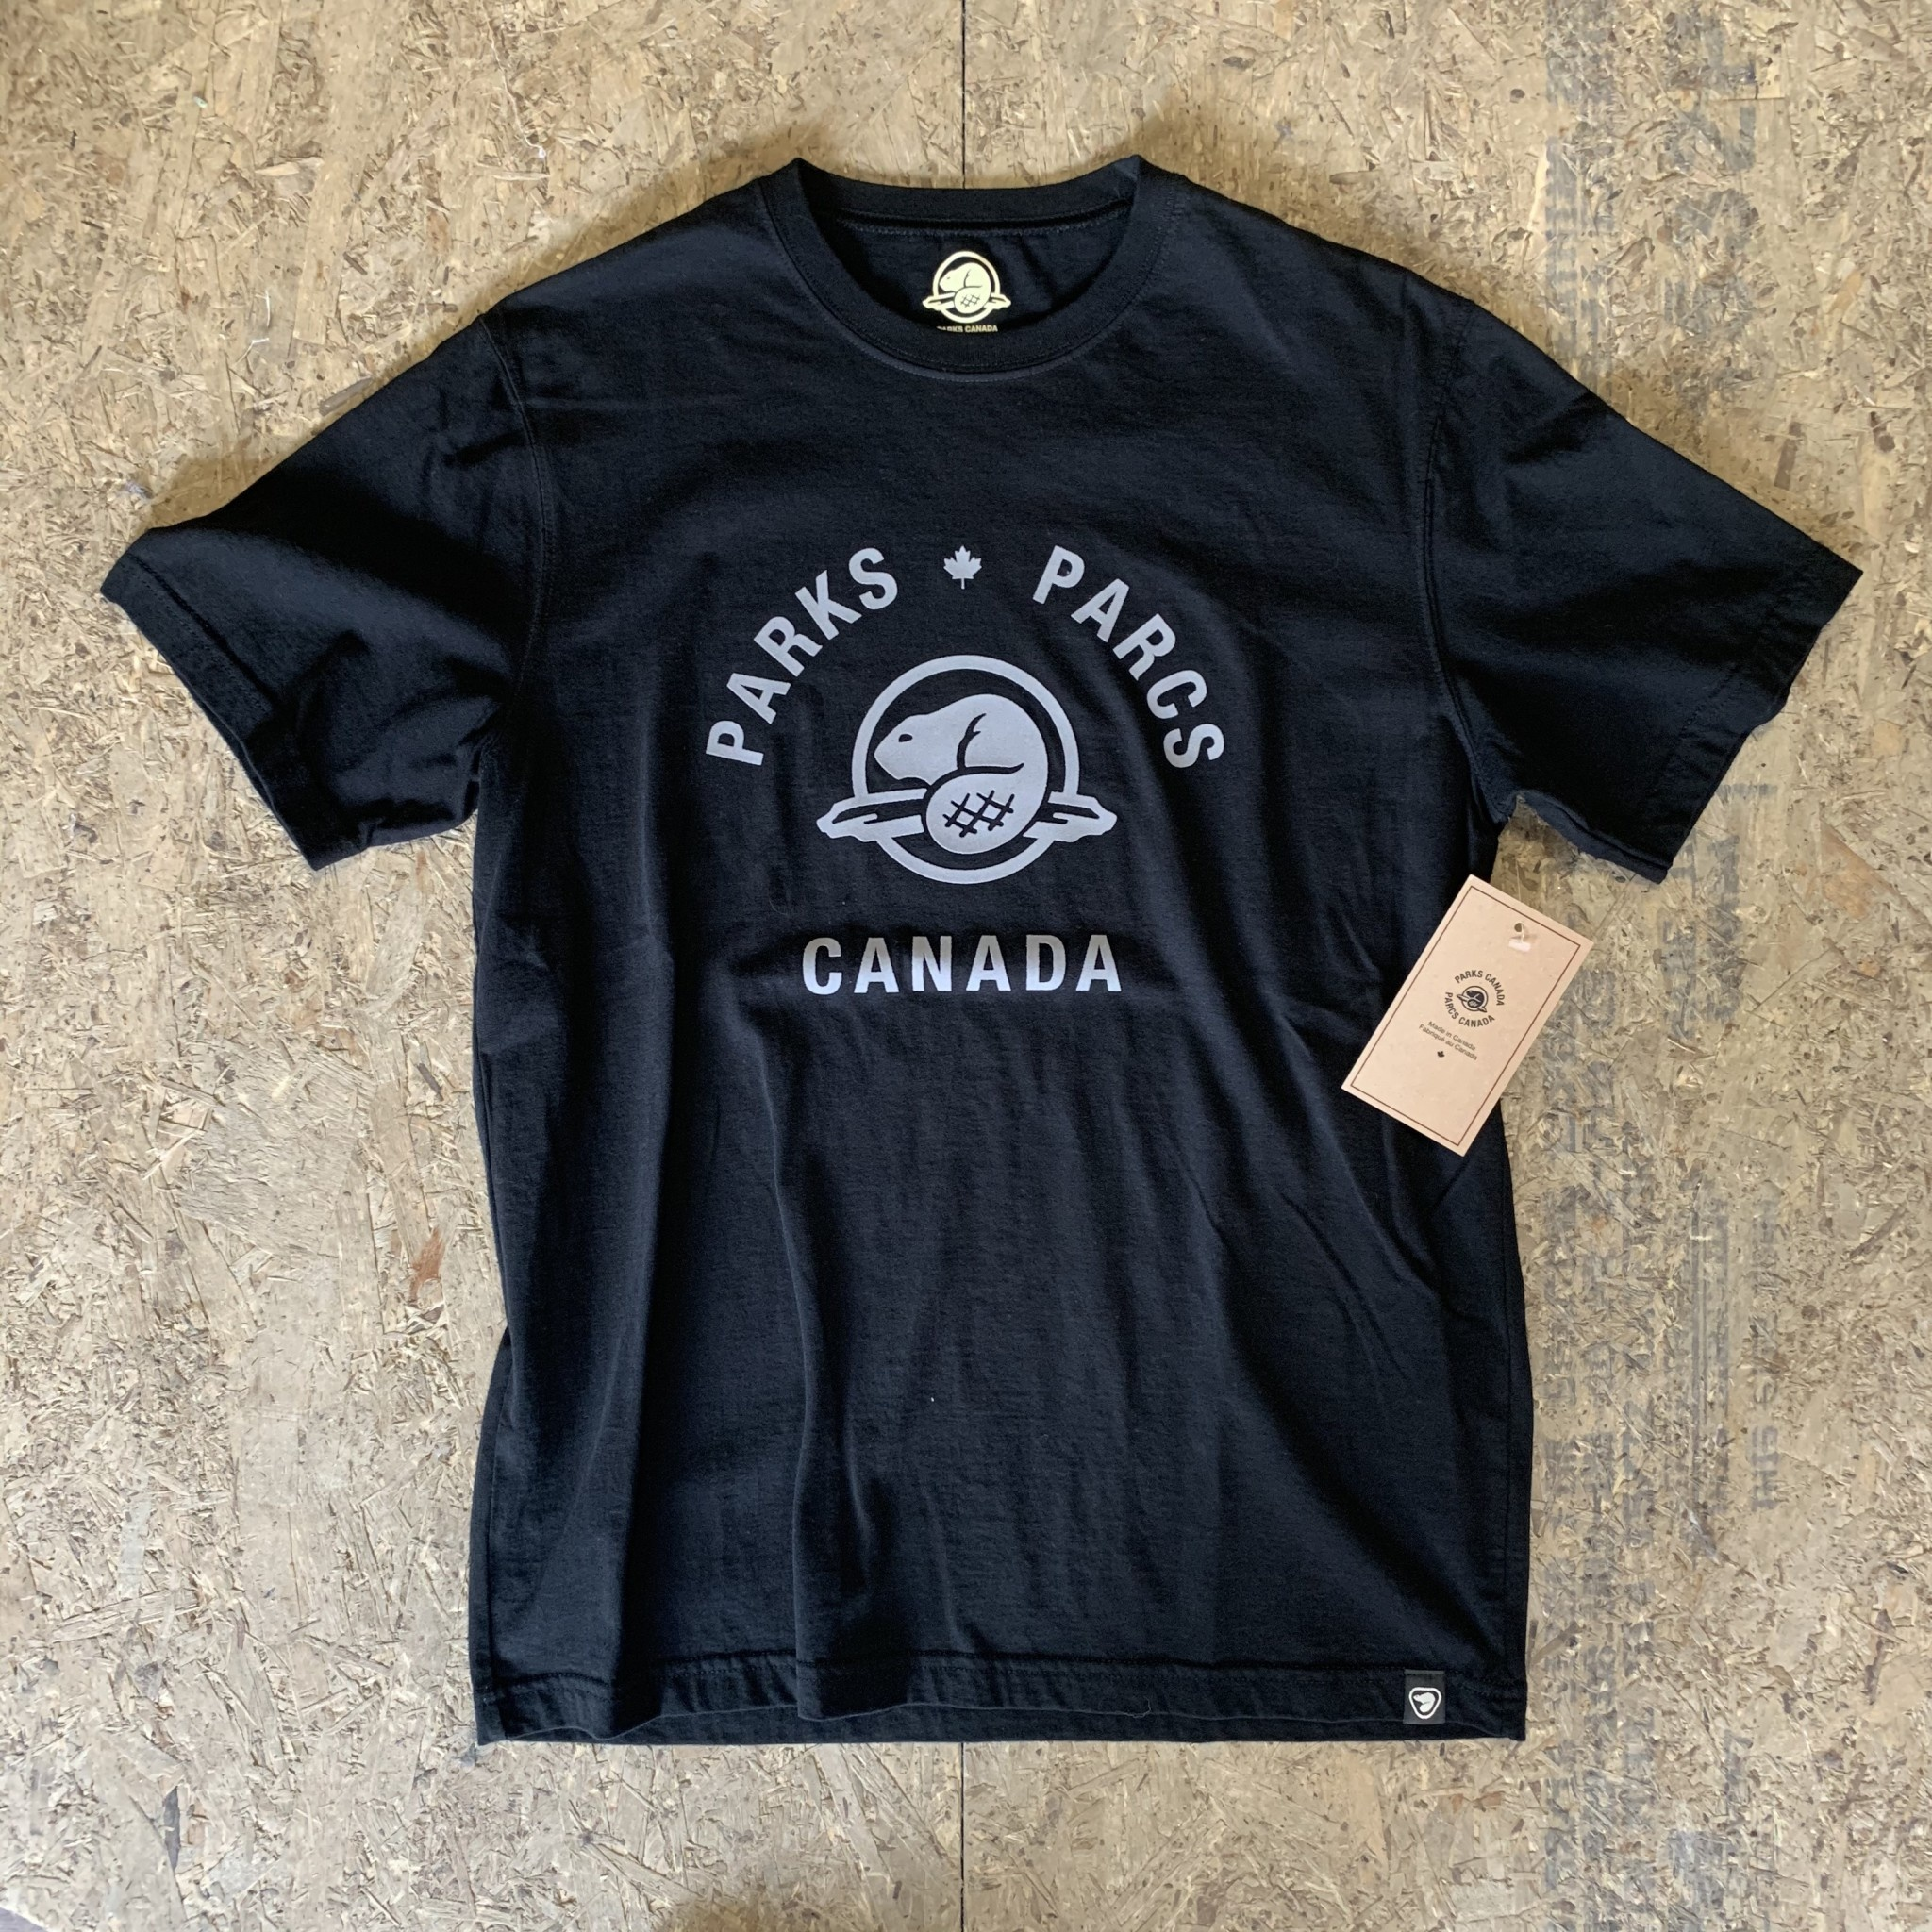 Parks Canada ParksCanada - Essential Tee - Blk - L